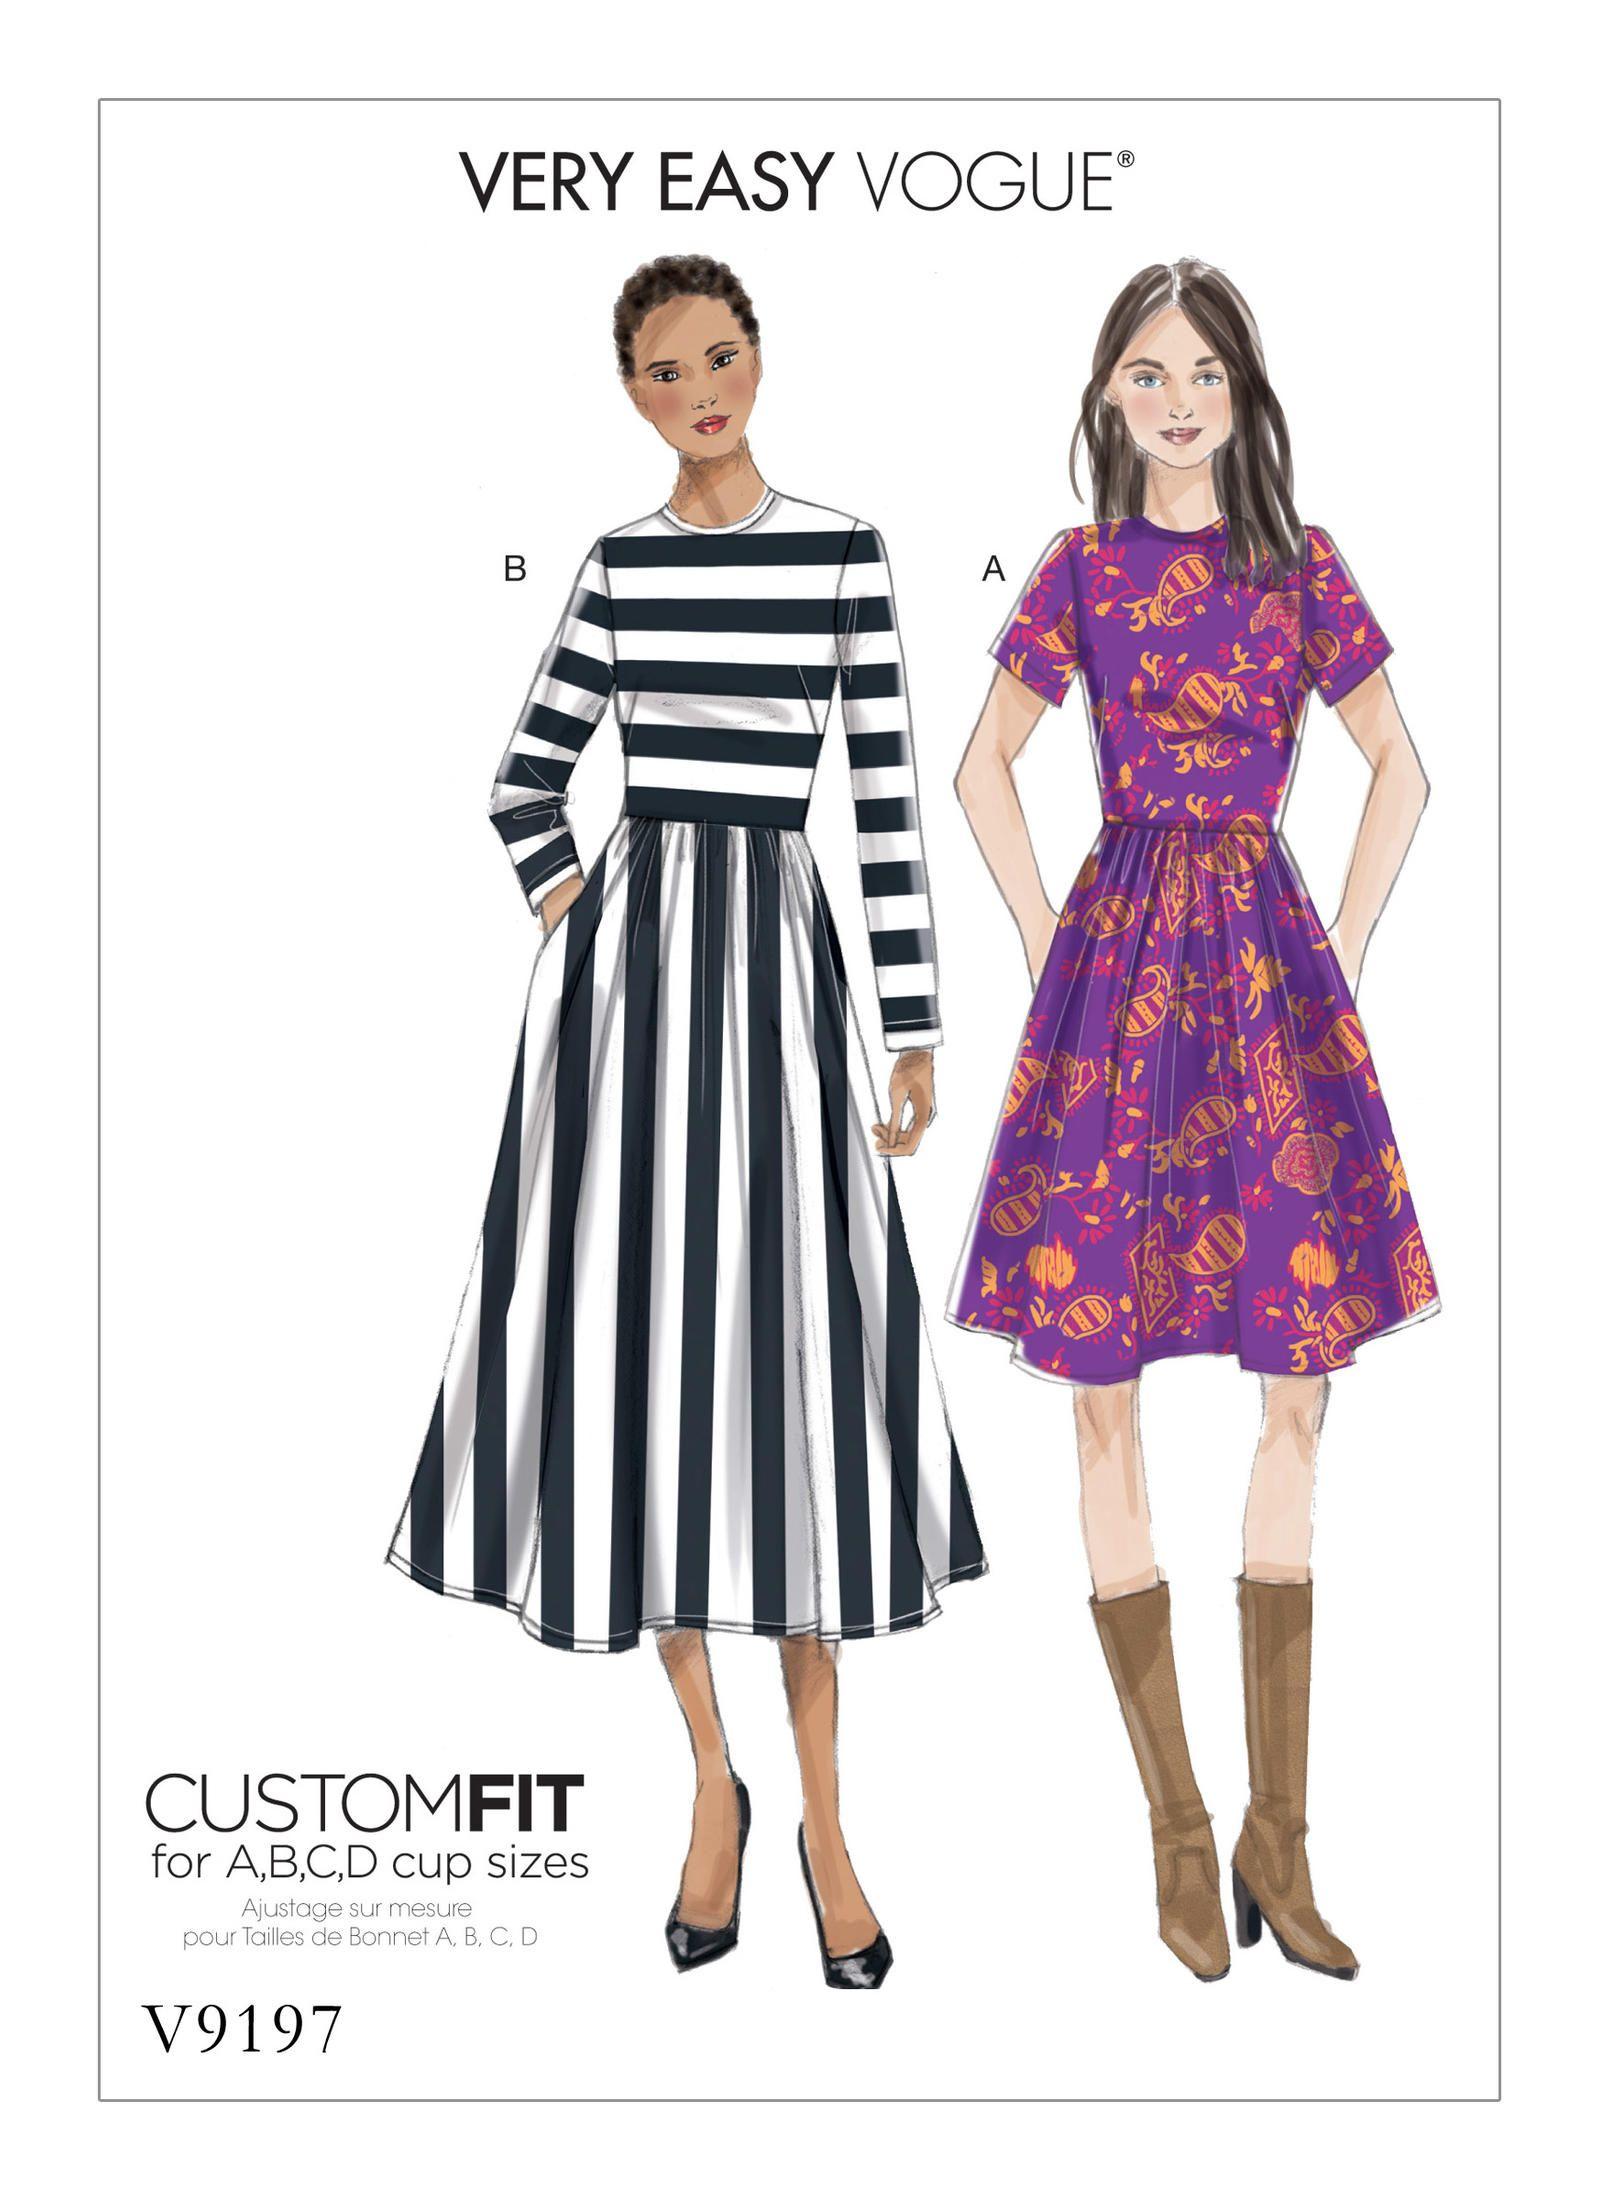 V9197 | Vogue Patterns | Blue Polka Dot Fabric | Pinterest | Sewing ...